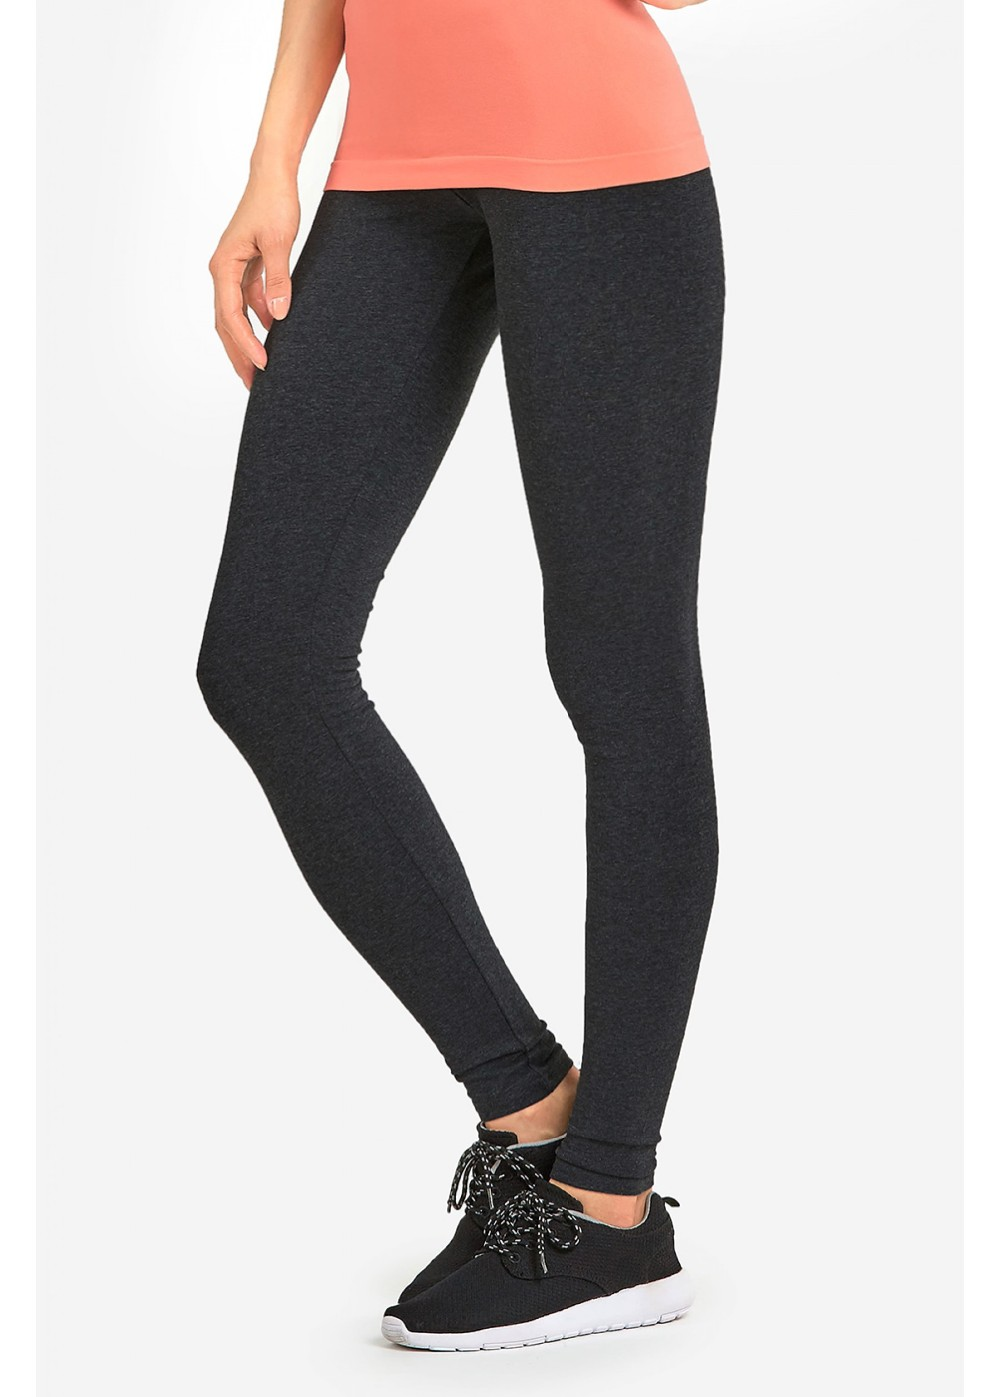 Gym Shark Skin Tight Yoga Pants Women Leggings - Buy Gym Shark ...